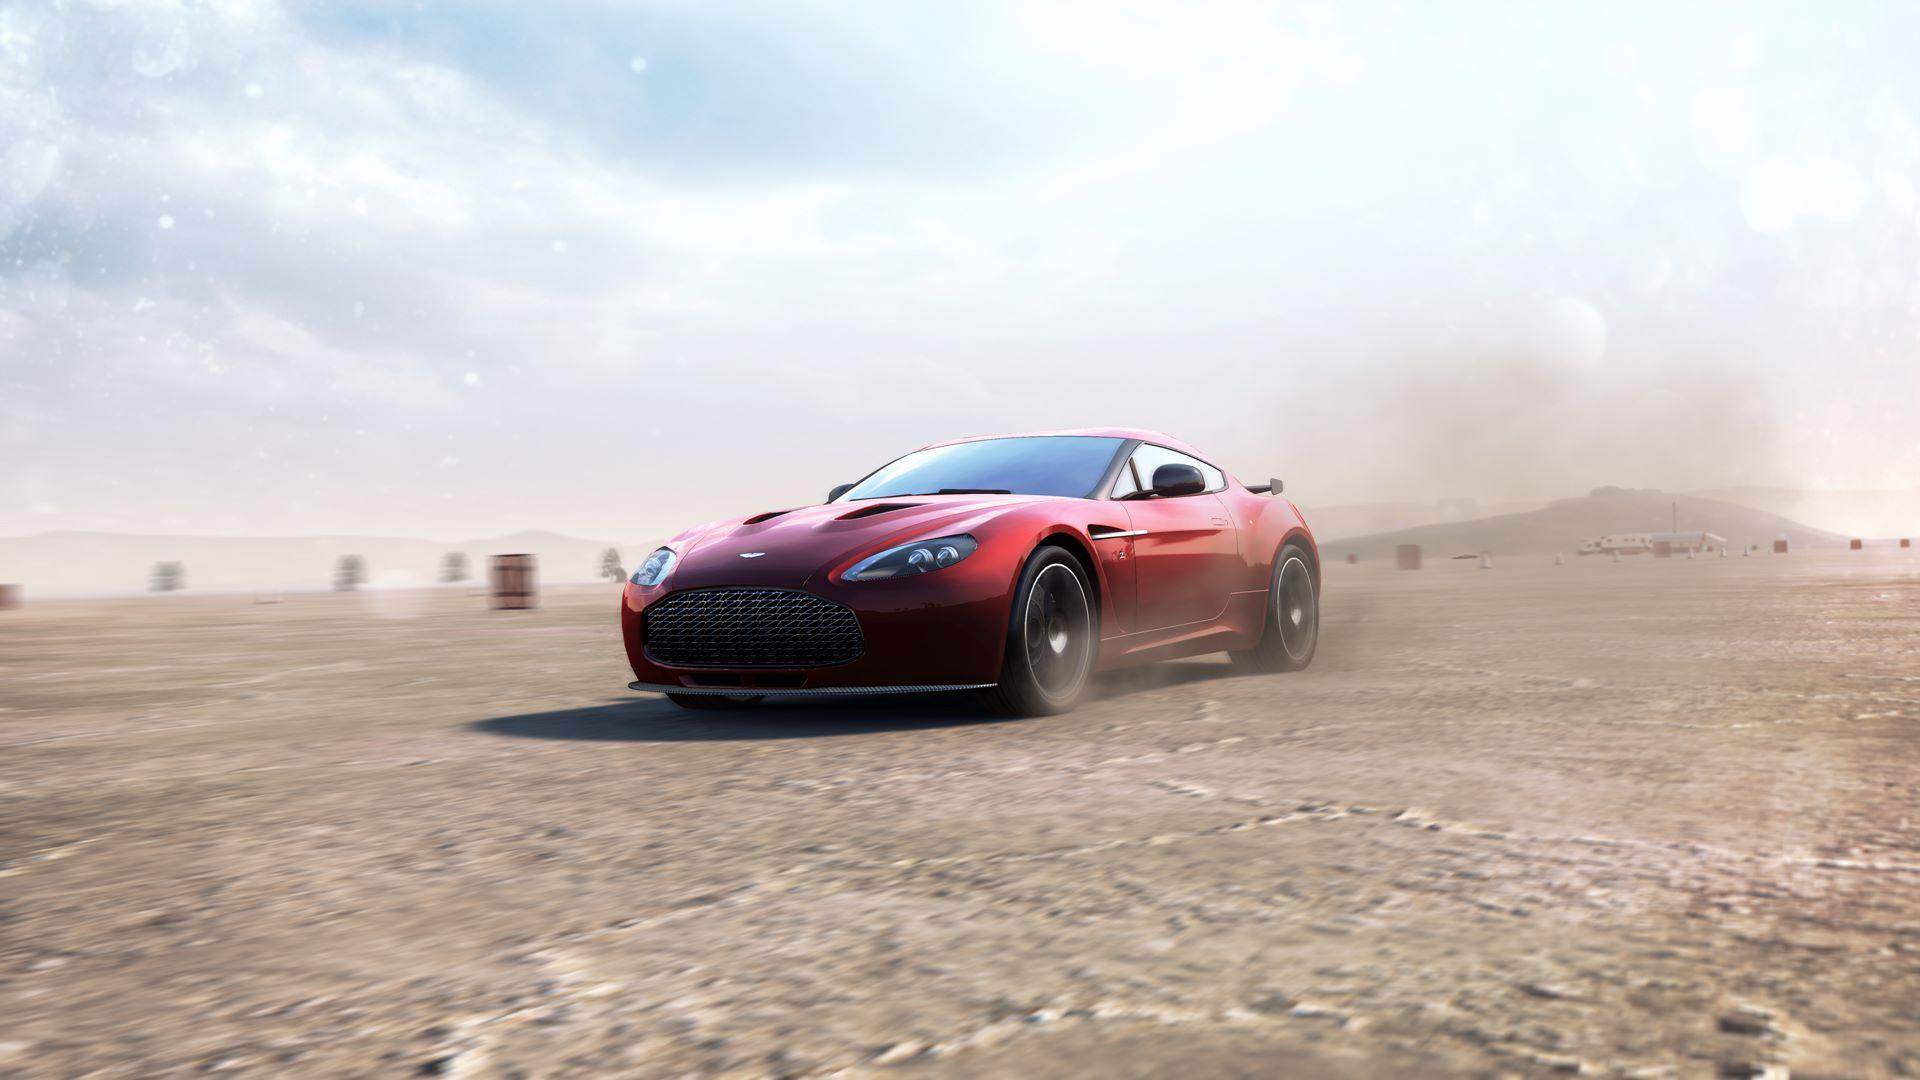 Buy Aston Martin V Zagato Car Shipment Microsoft Store EnIN - Buy aston martin